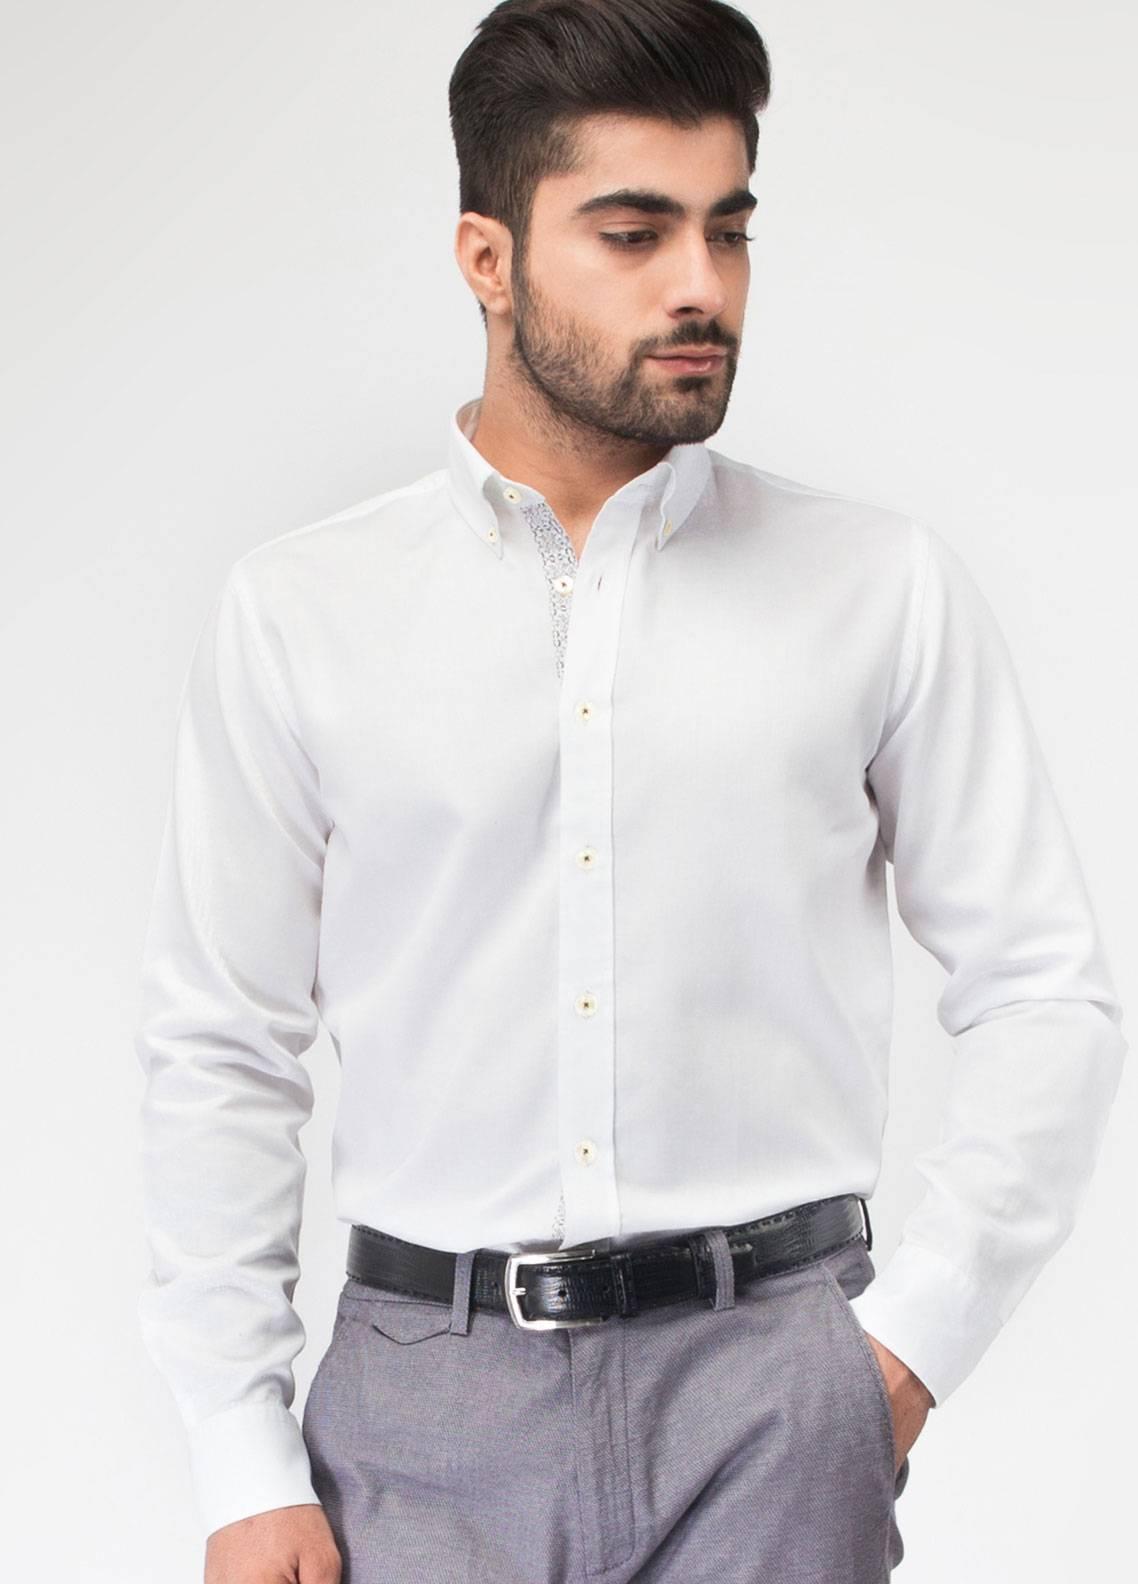 Brumano Cotton Formal Shirts for Men - White BRM-542